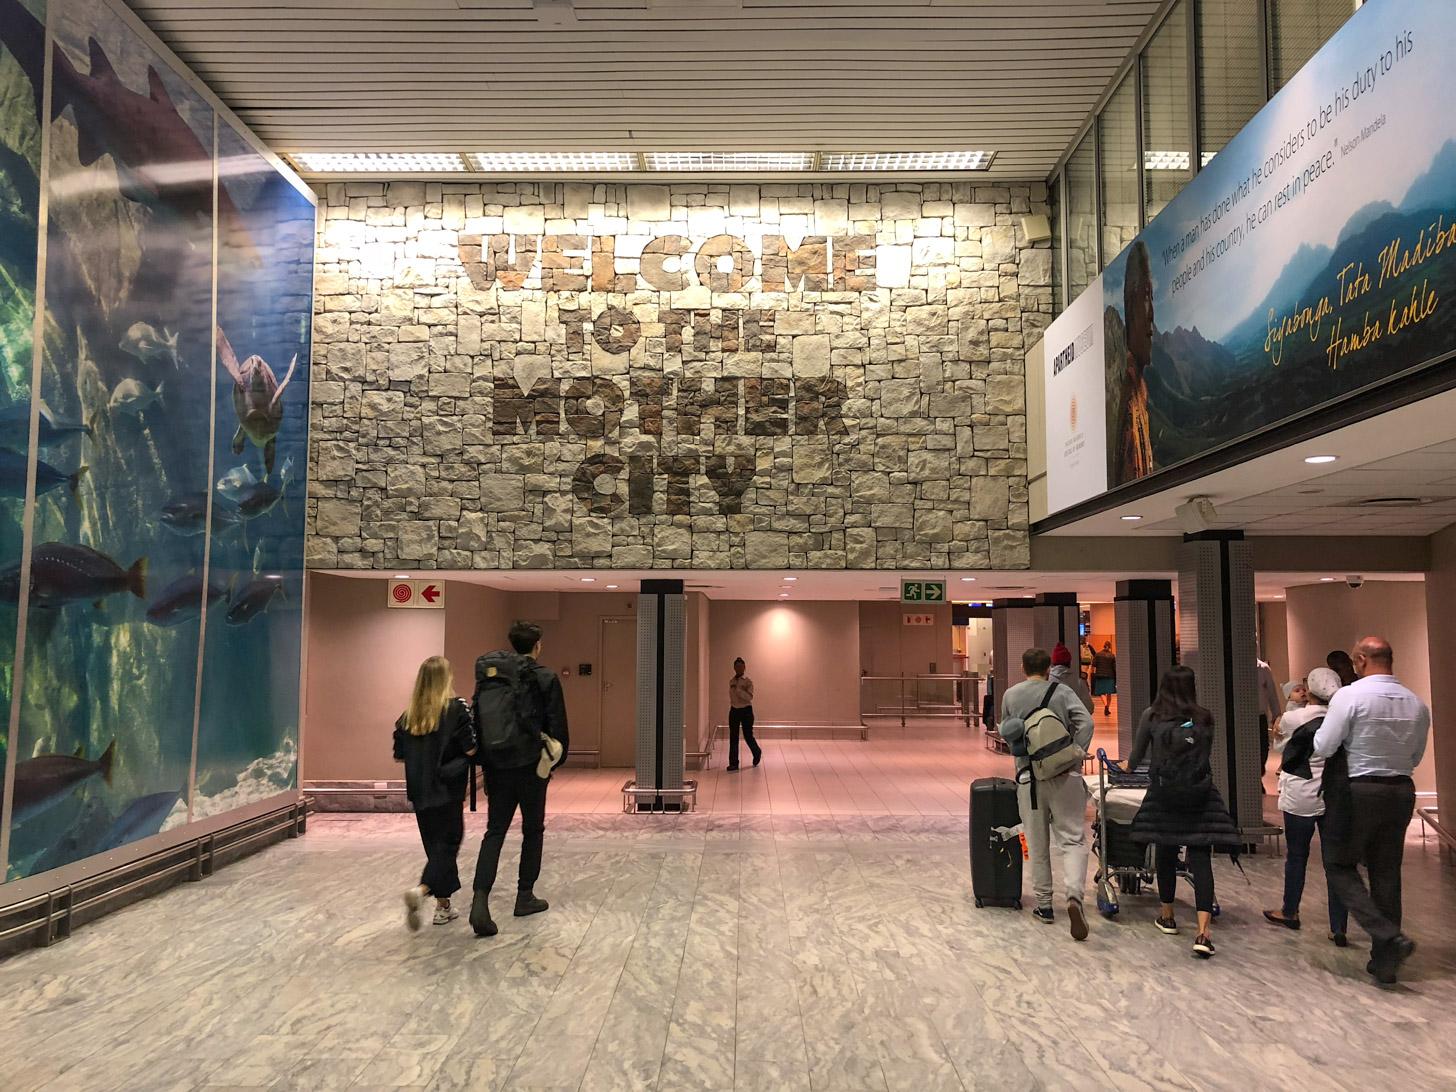 Welkom in Kaapstad - Cape Town Intl. Airport